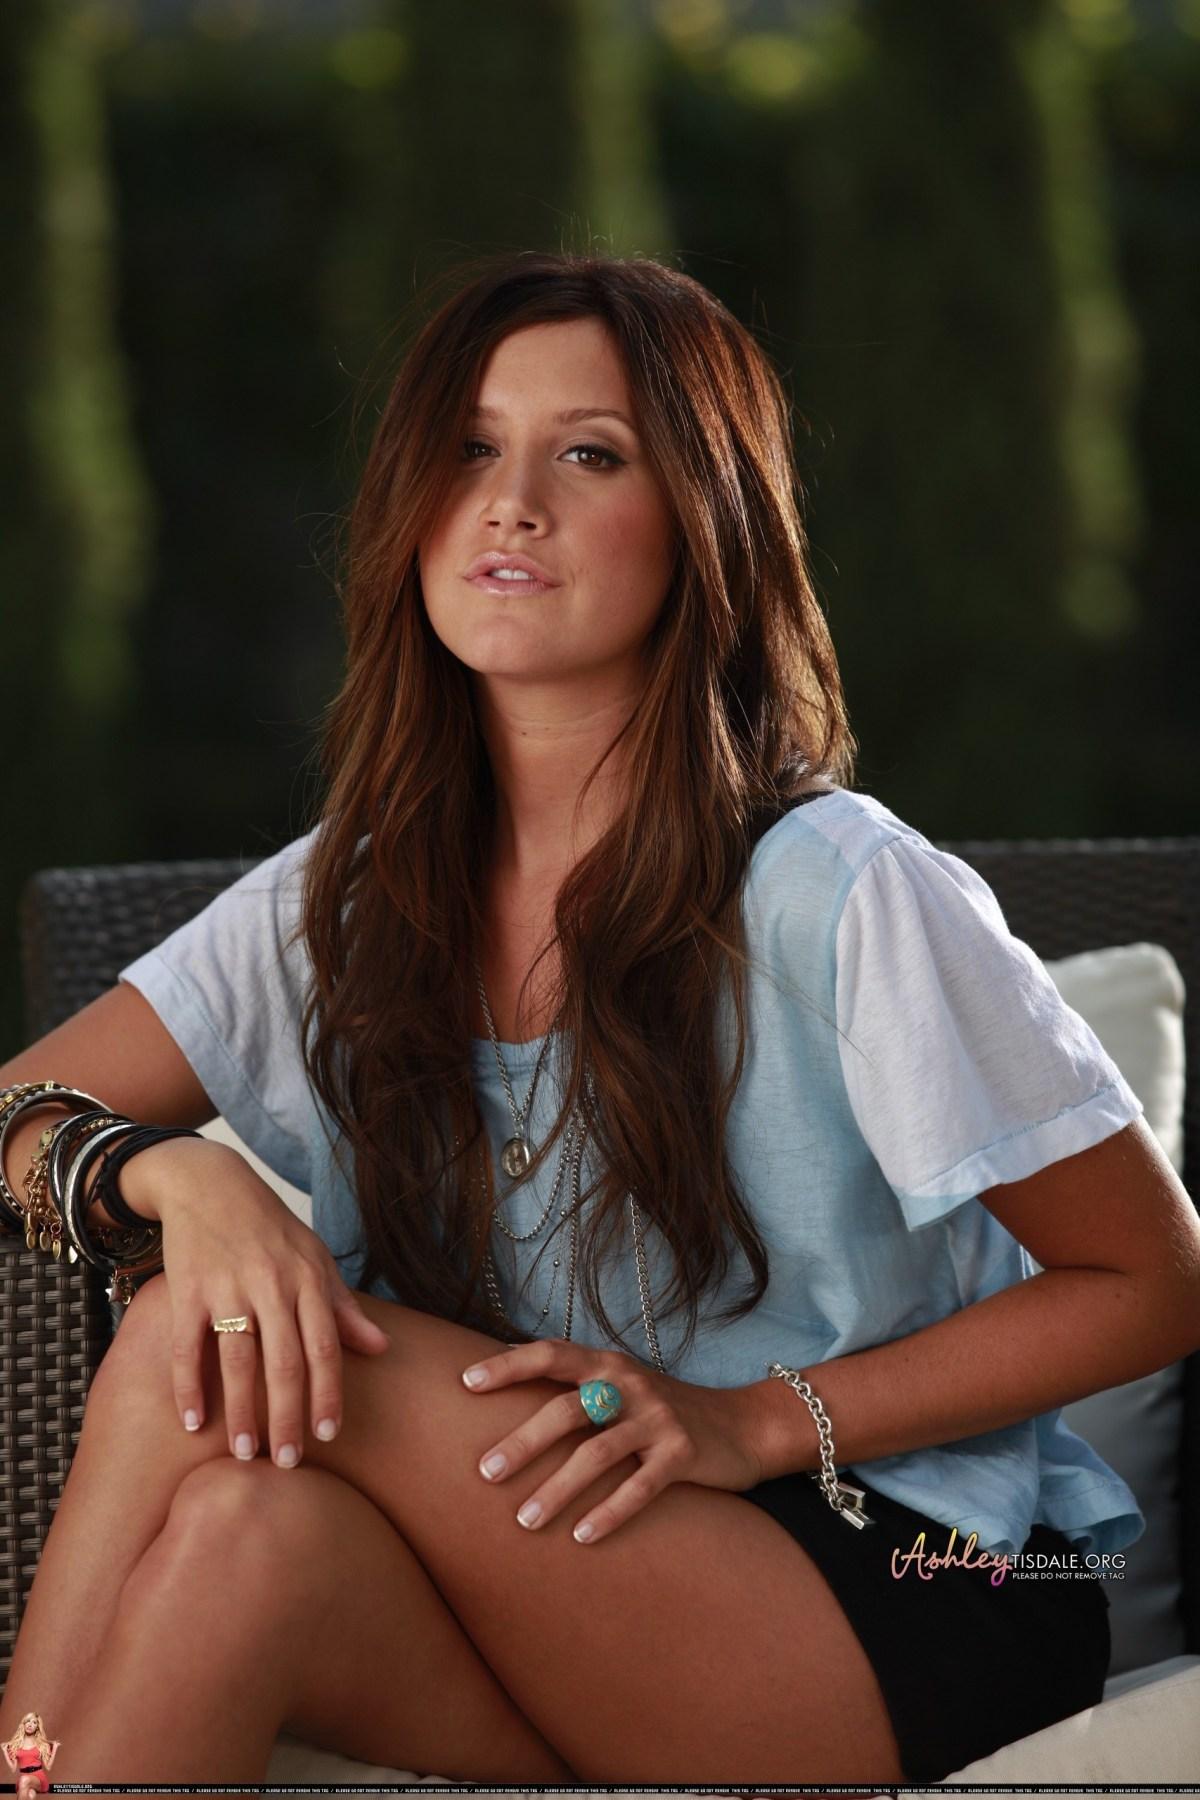 Ashley Tisdale hot